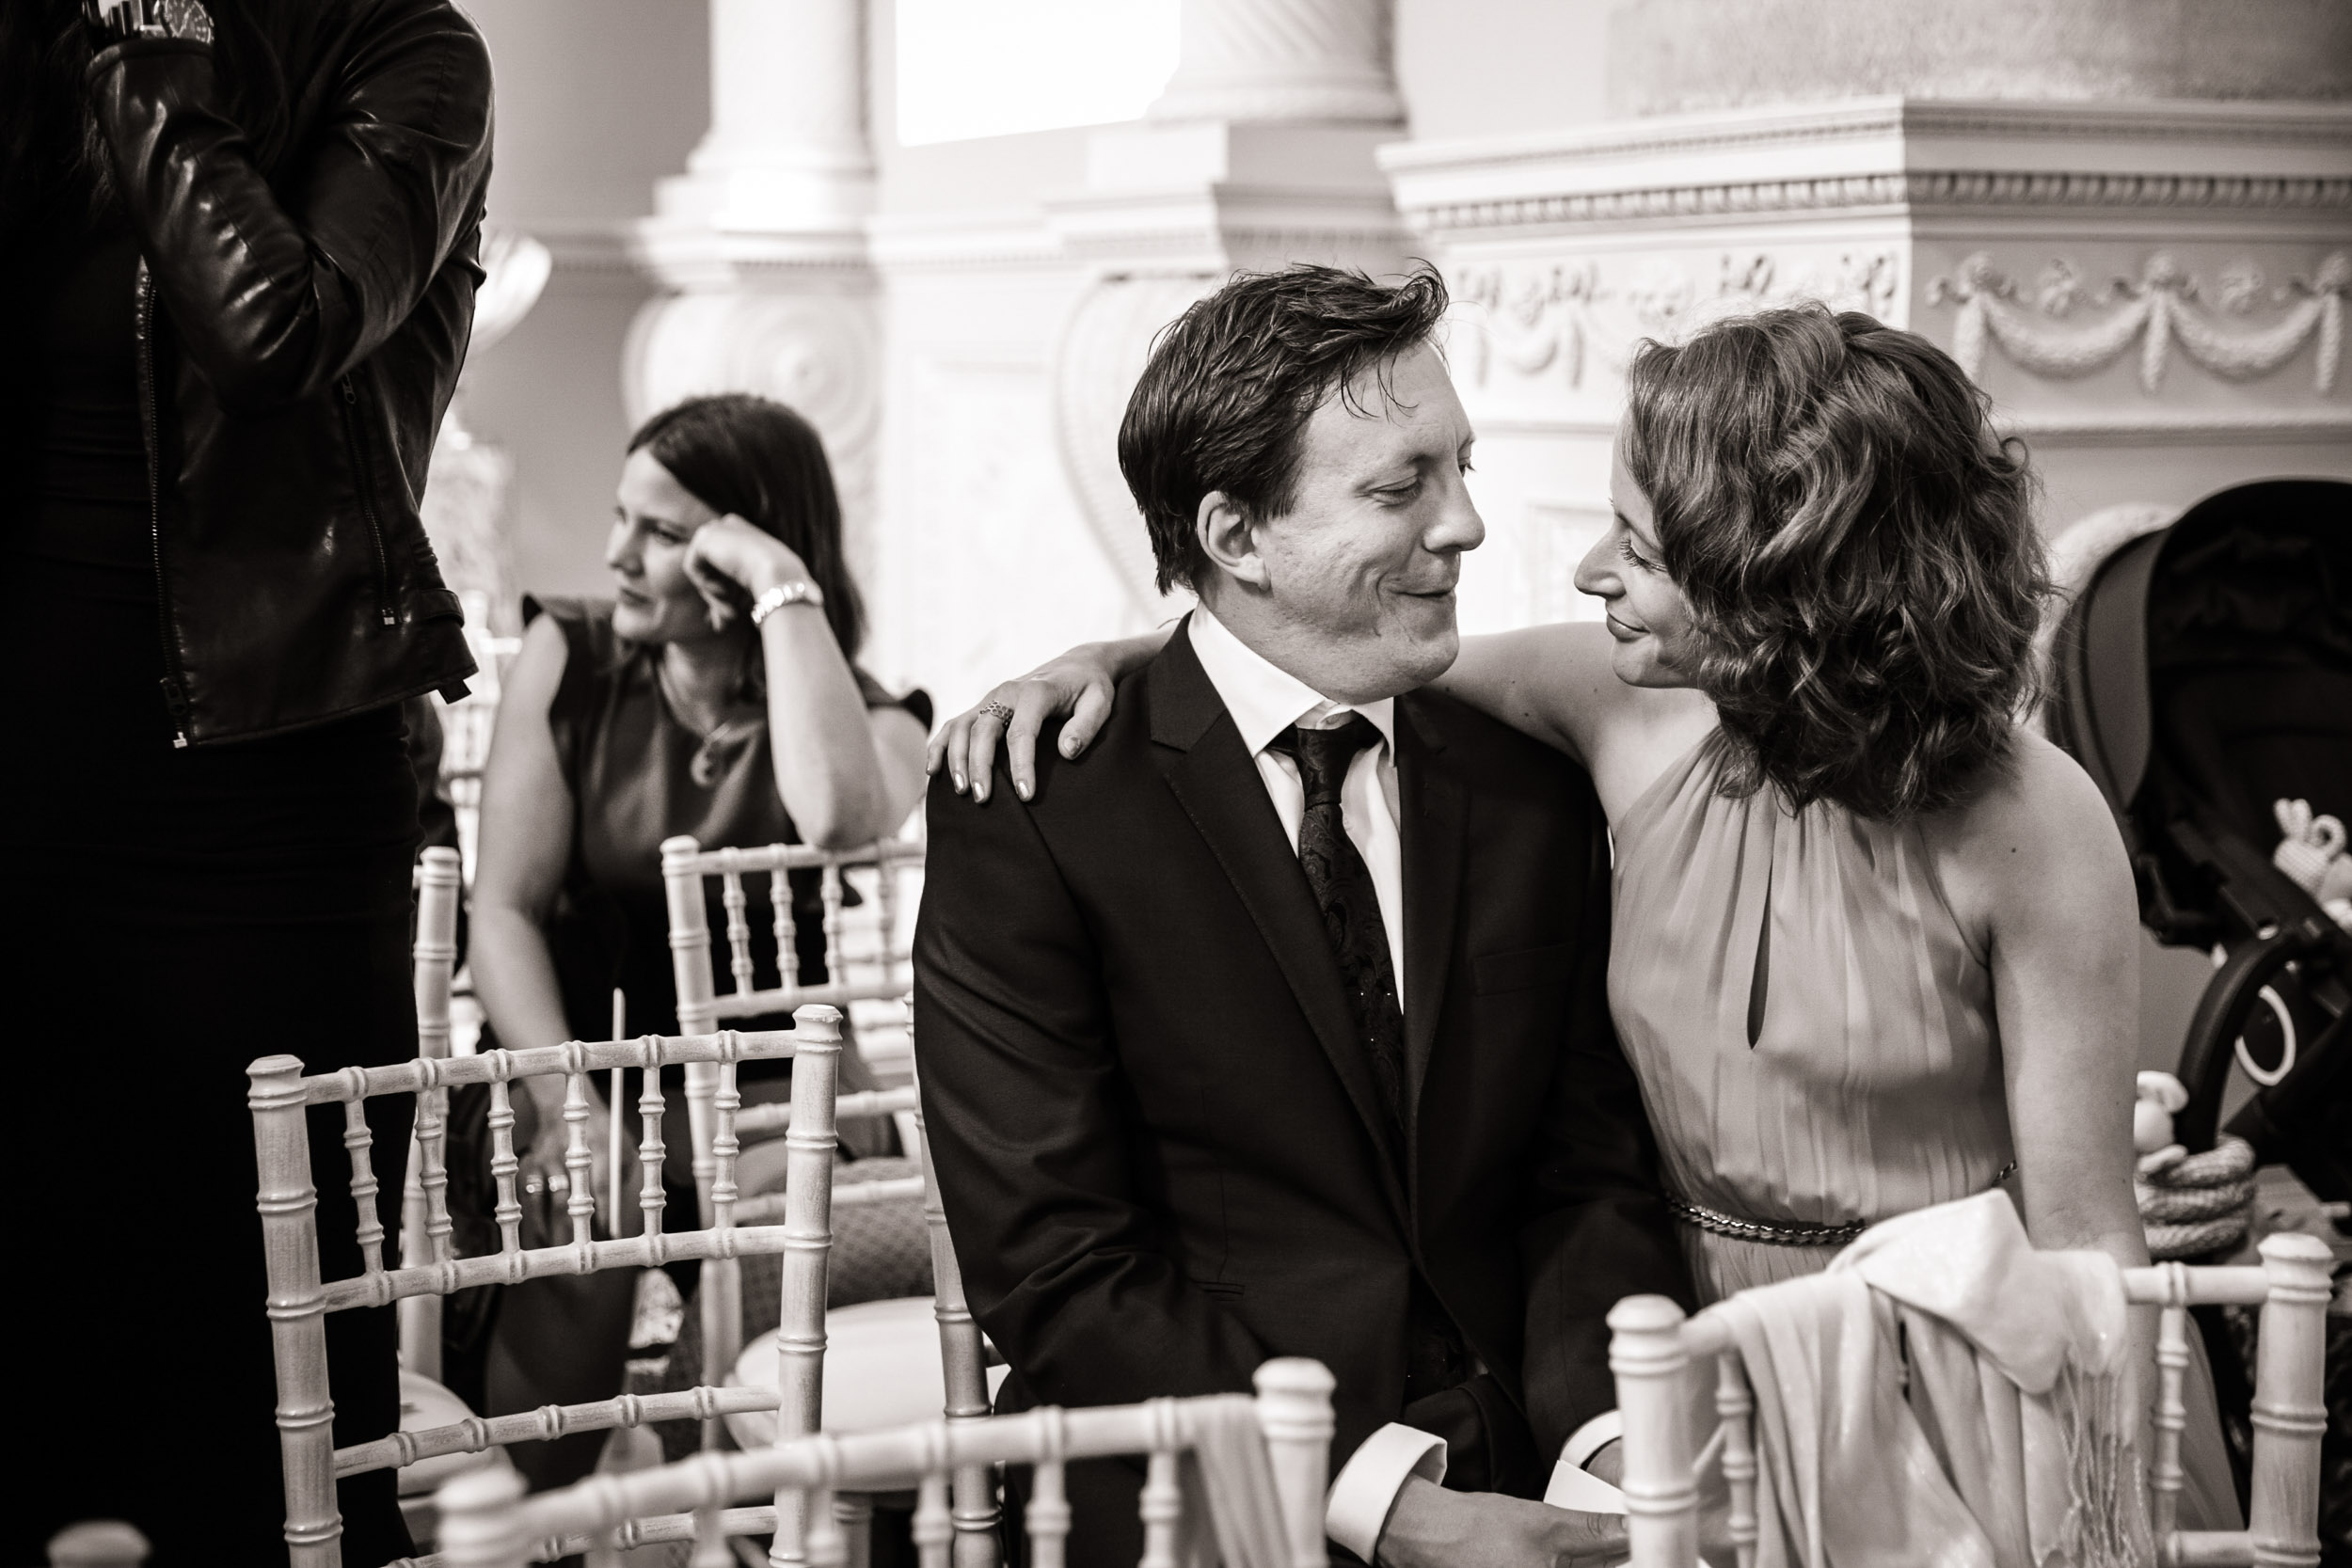 syon-house-wedding-photographer-london 036.jpg